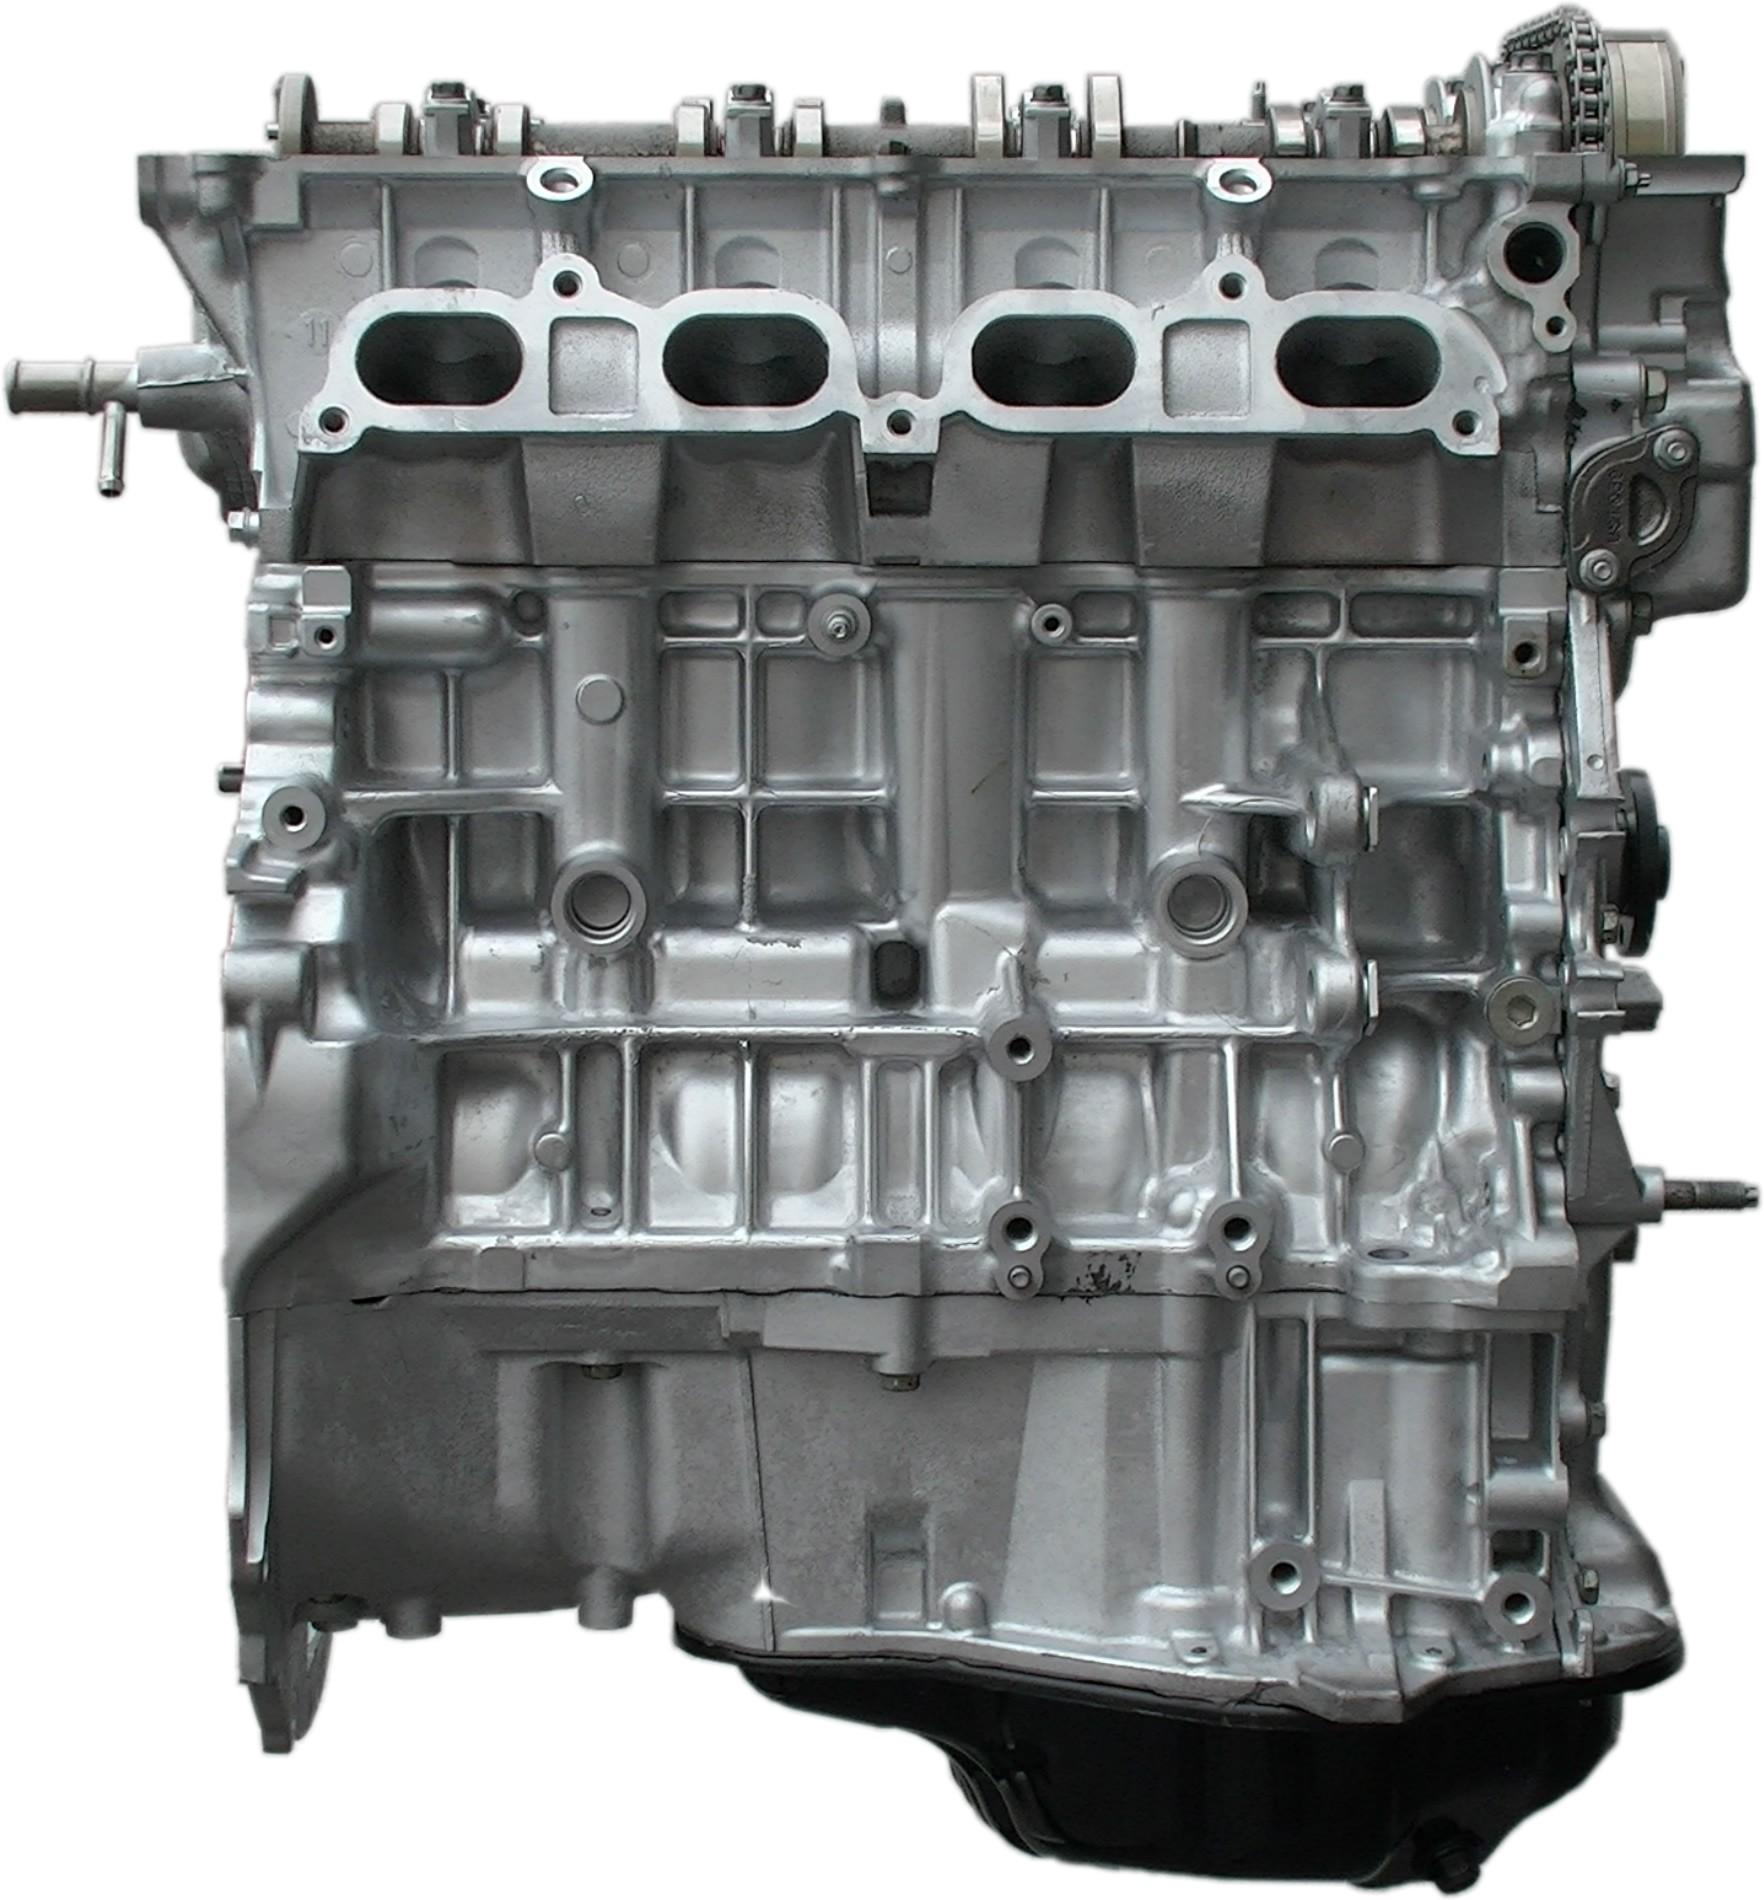 Toyota Highlander Service Manual: Engine (2AZ-FE)